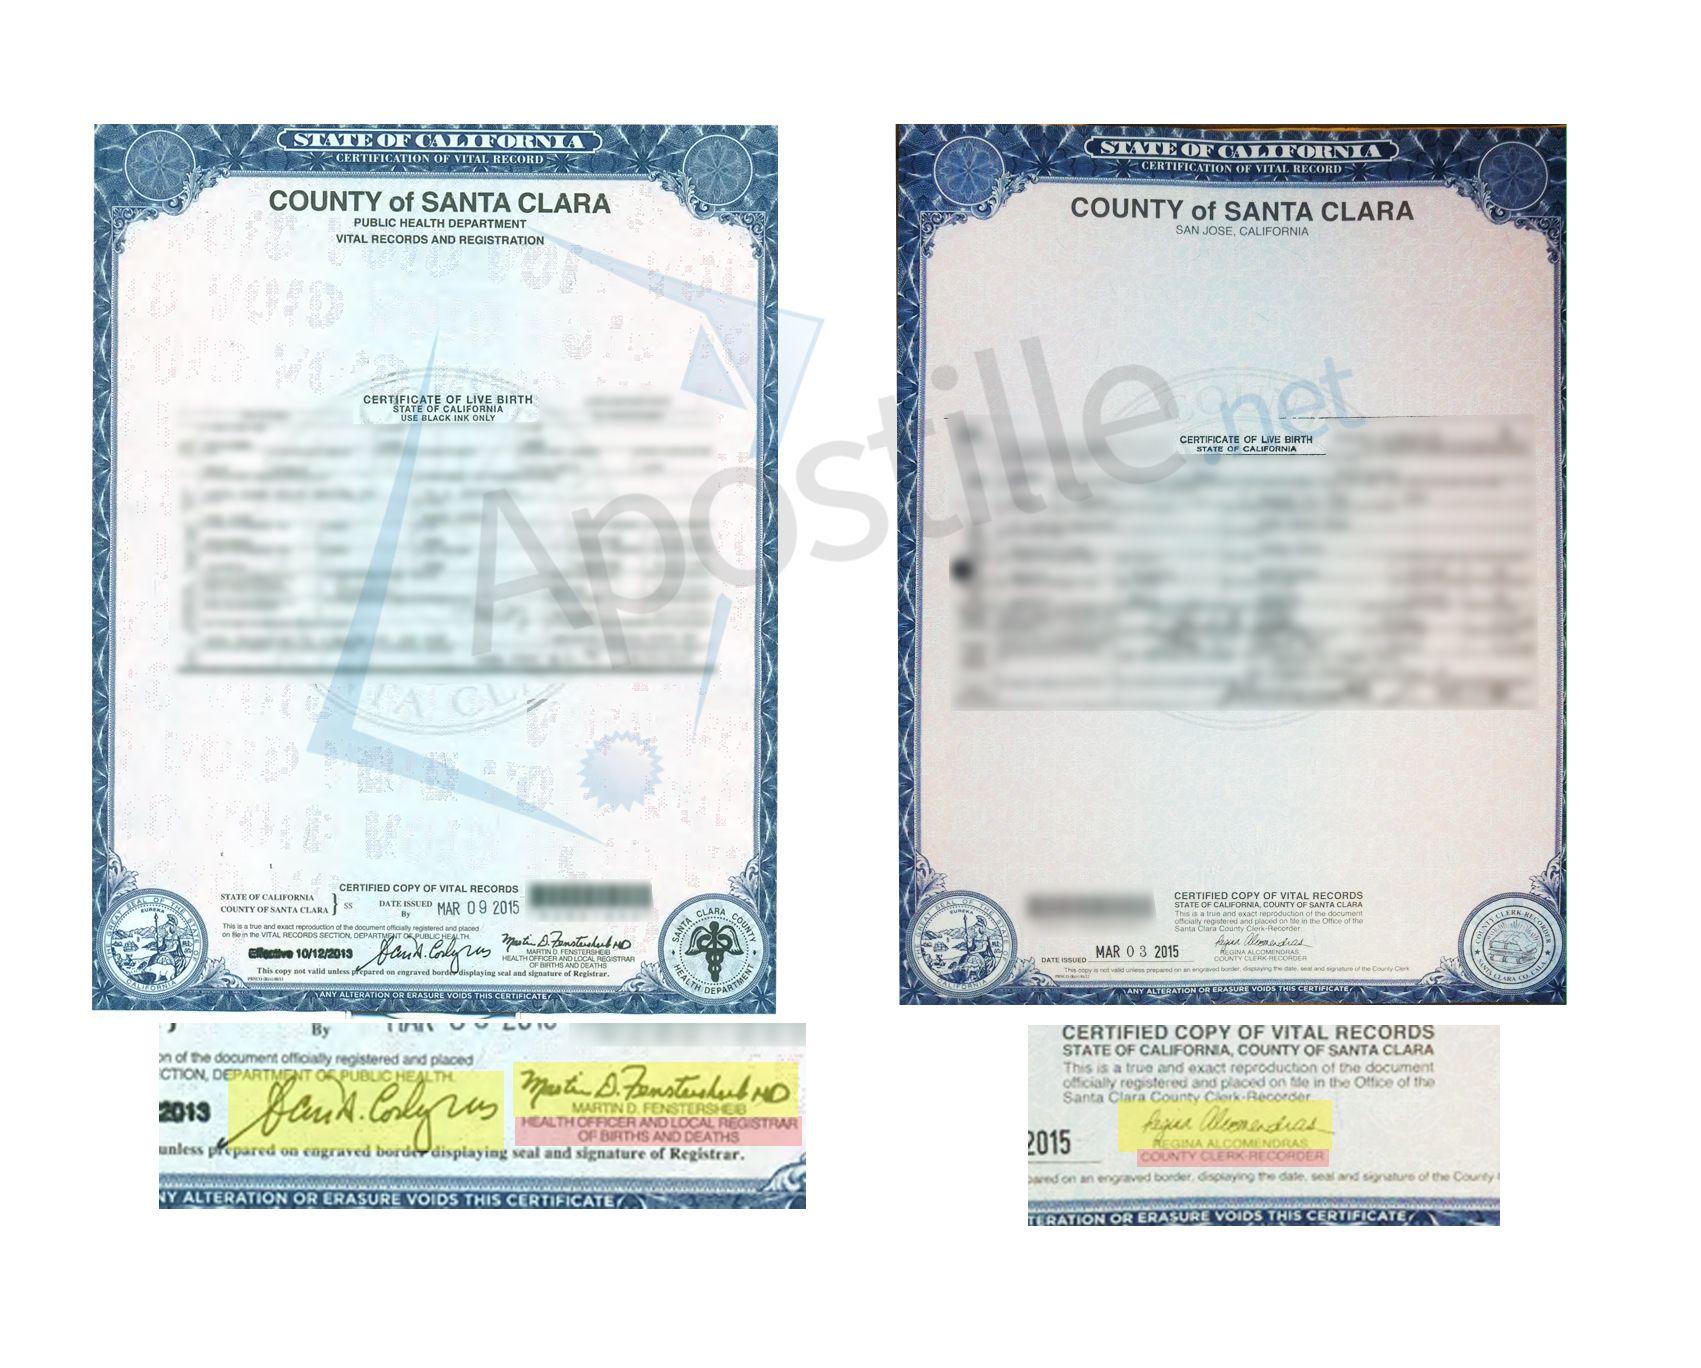 County of san mateo certificate of birth signed by scott morrow county of san mateo certificate of birth signed by scott morrow state of california sample apostille pinterest san mateo 1betcityfo Choice Image